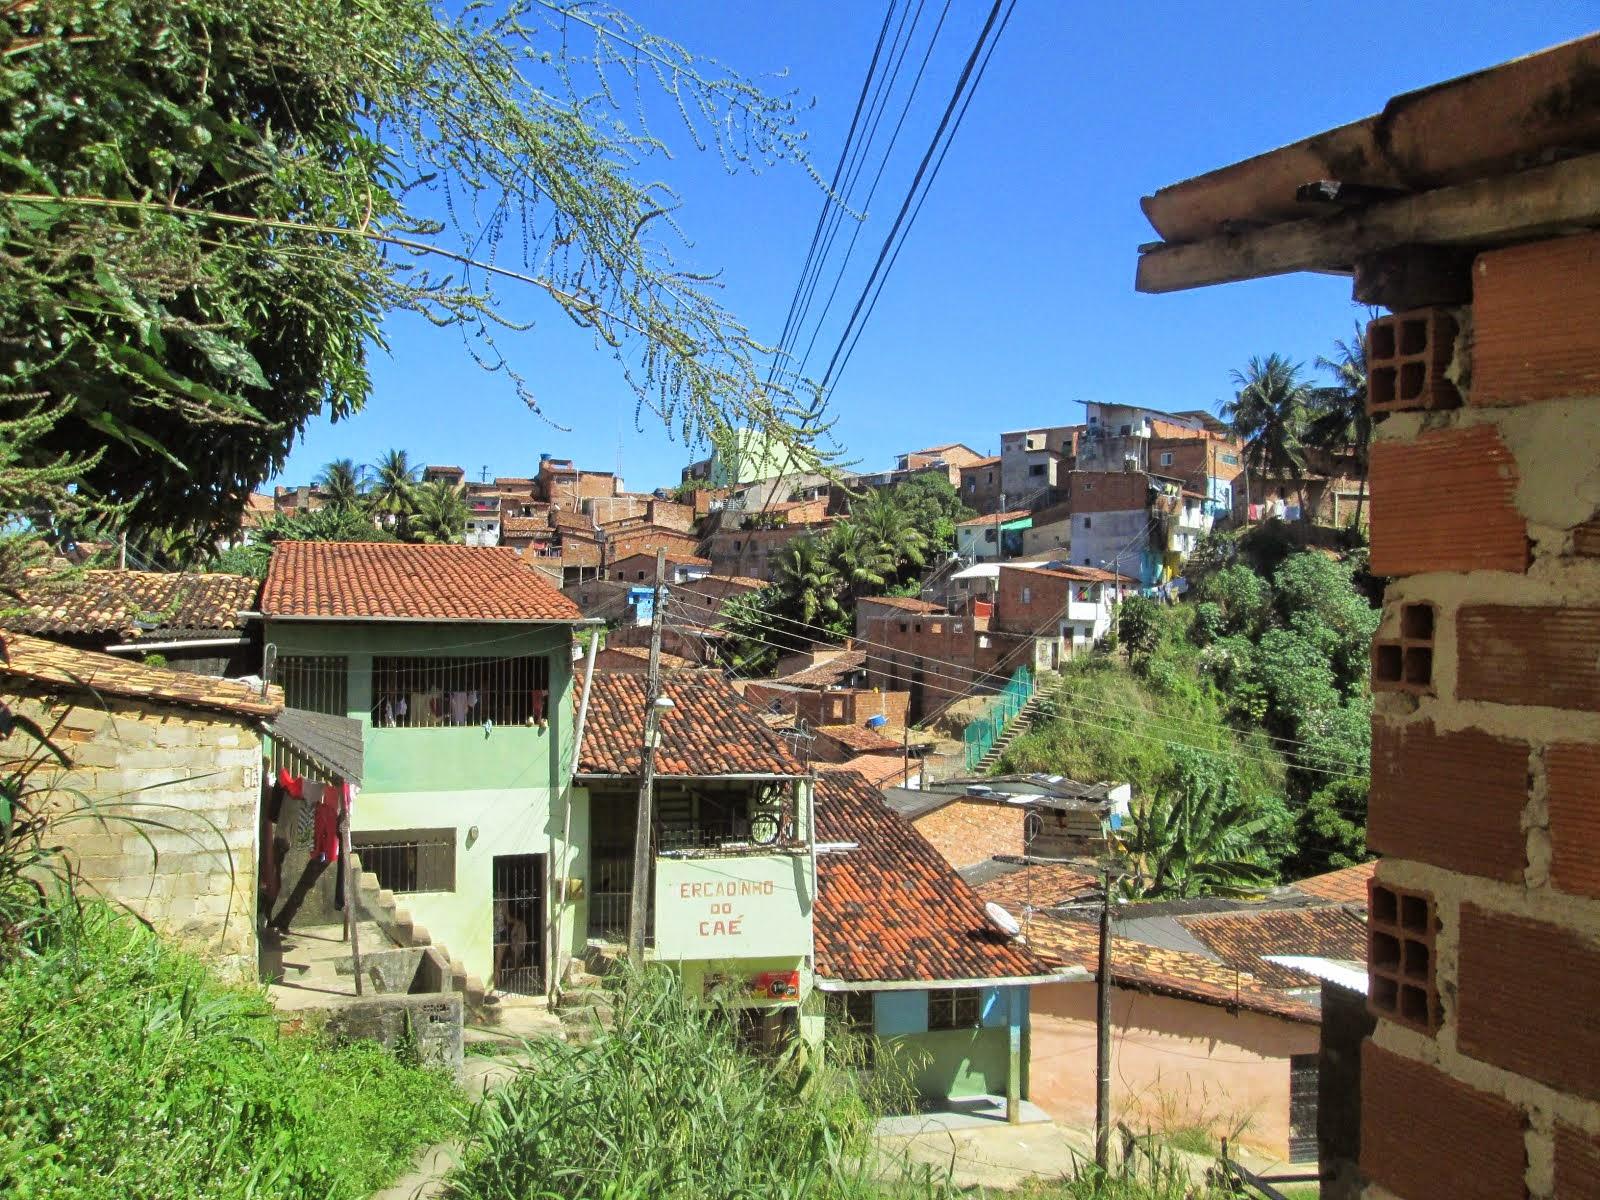 6th Area Jacintinho Maceió Alagoas  7/12/14